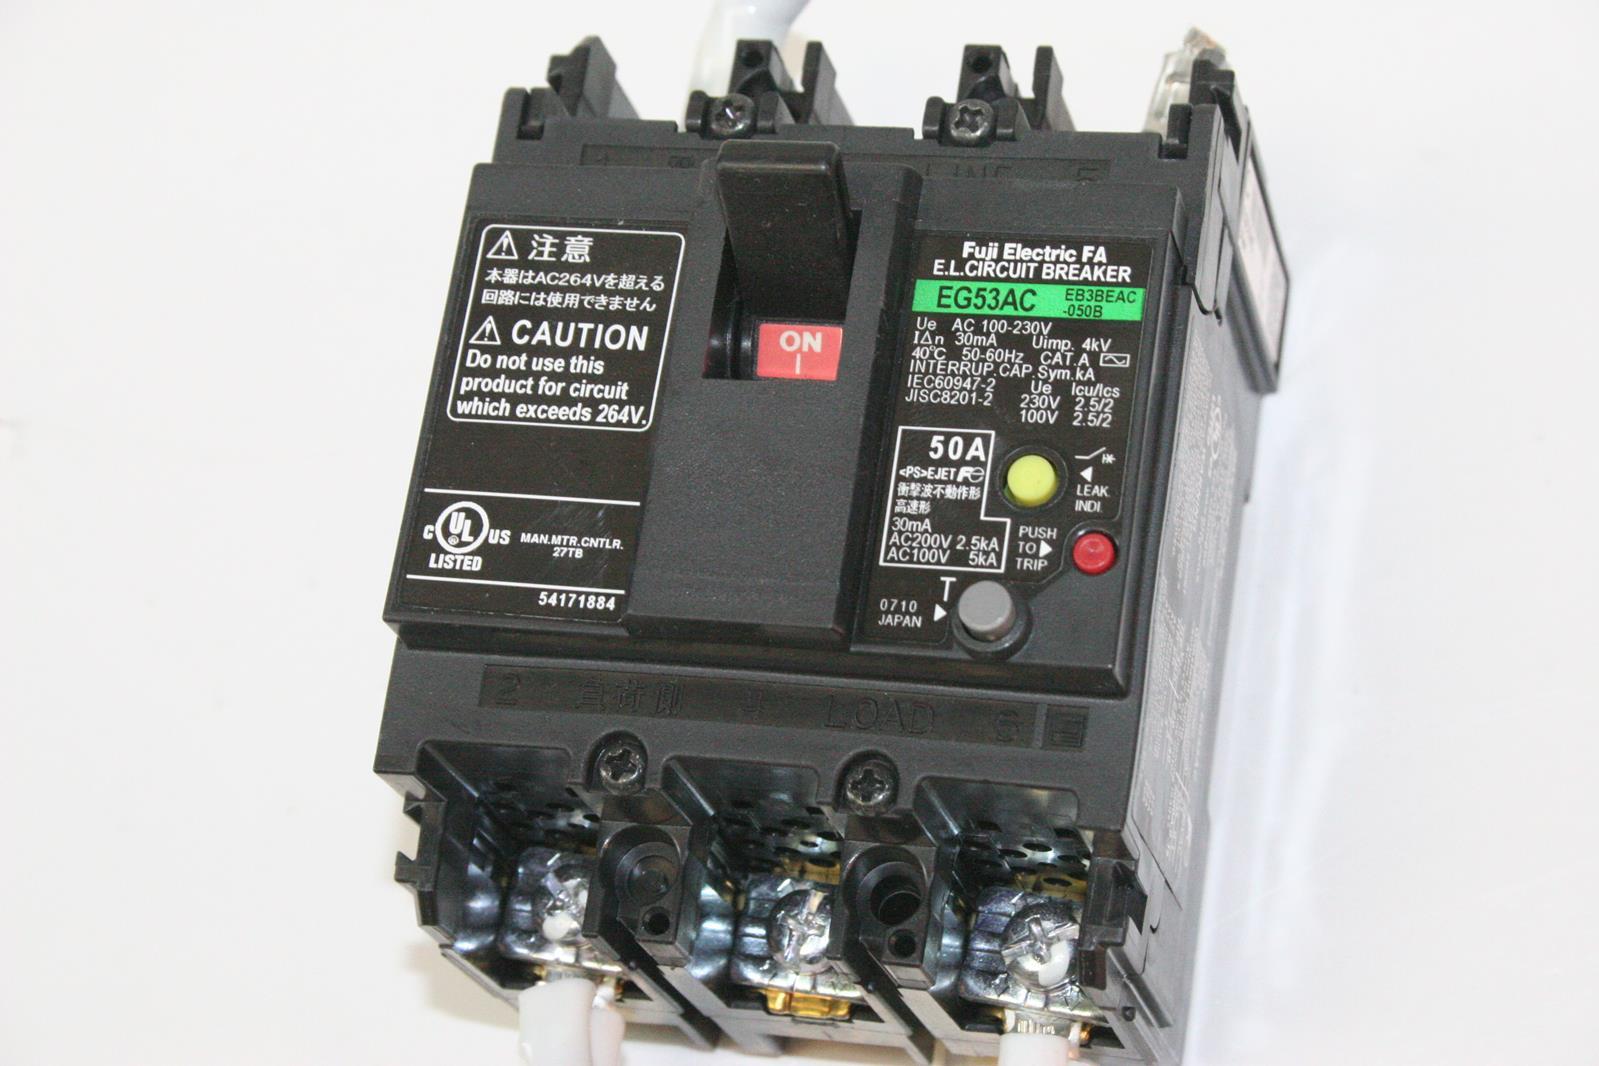 fuji electric eb3beac 050b eg53ac 50a 3 pole 100 230vac circuit rh ebay com is 5 2/5 a rational number is 5 2/5 a rational number